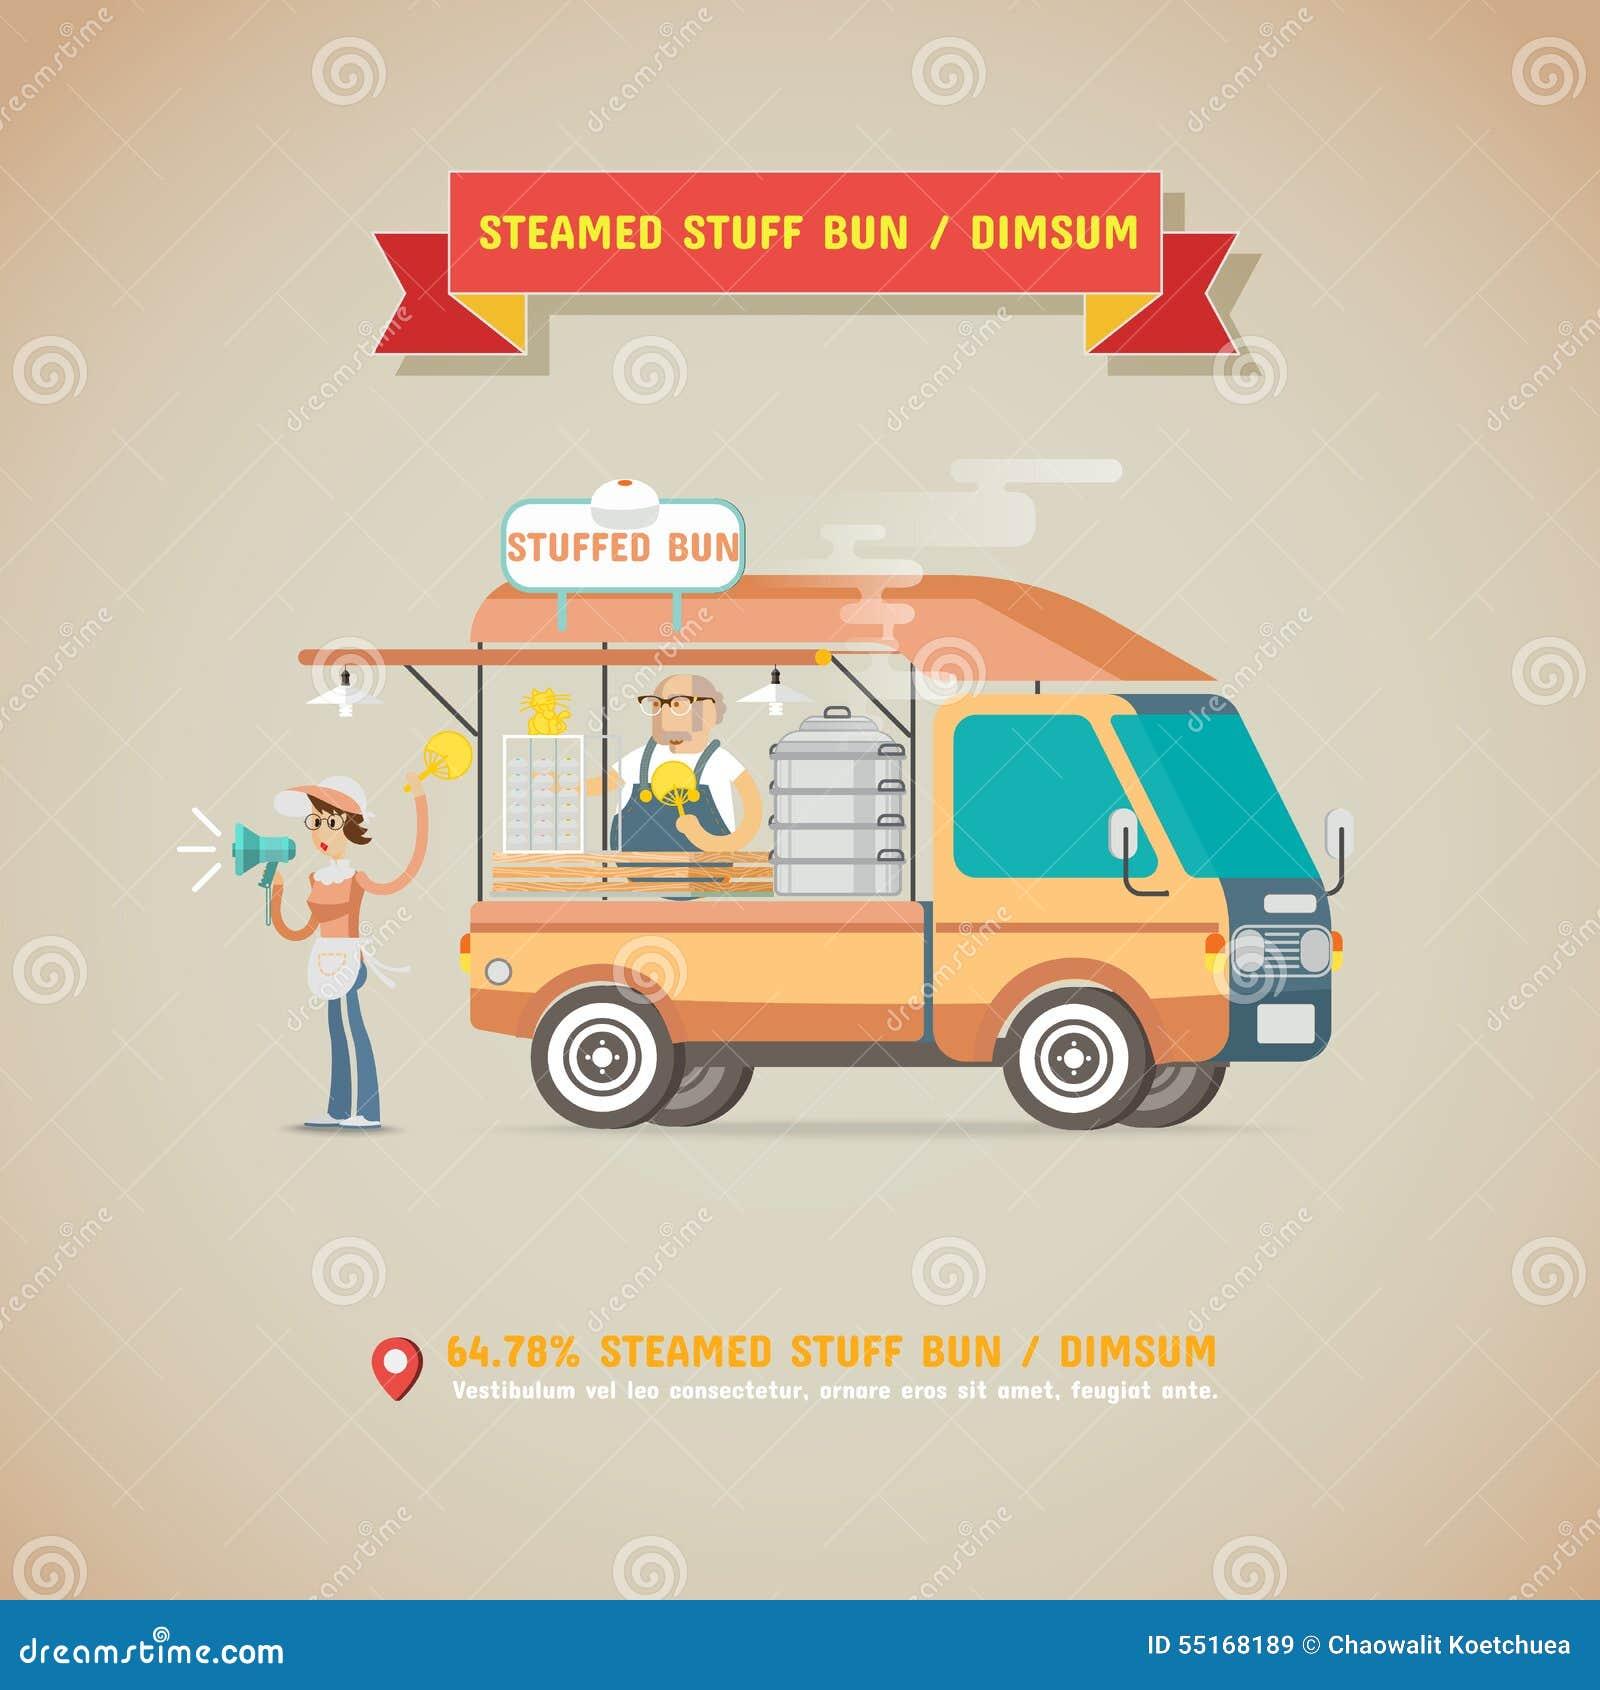 Steamed Stuff Bun, Dim Sum, Vehicle shop